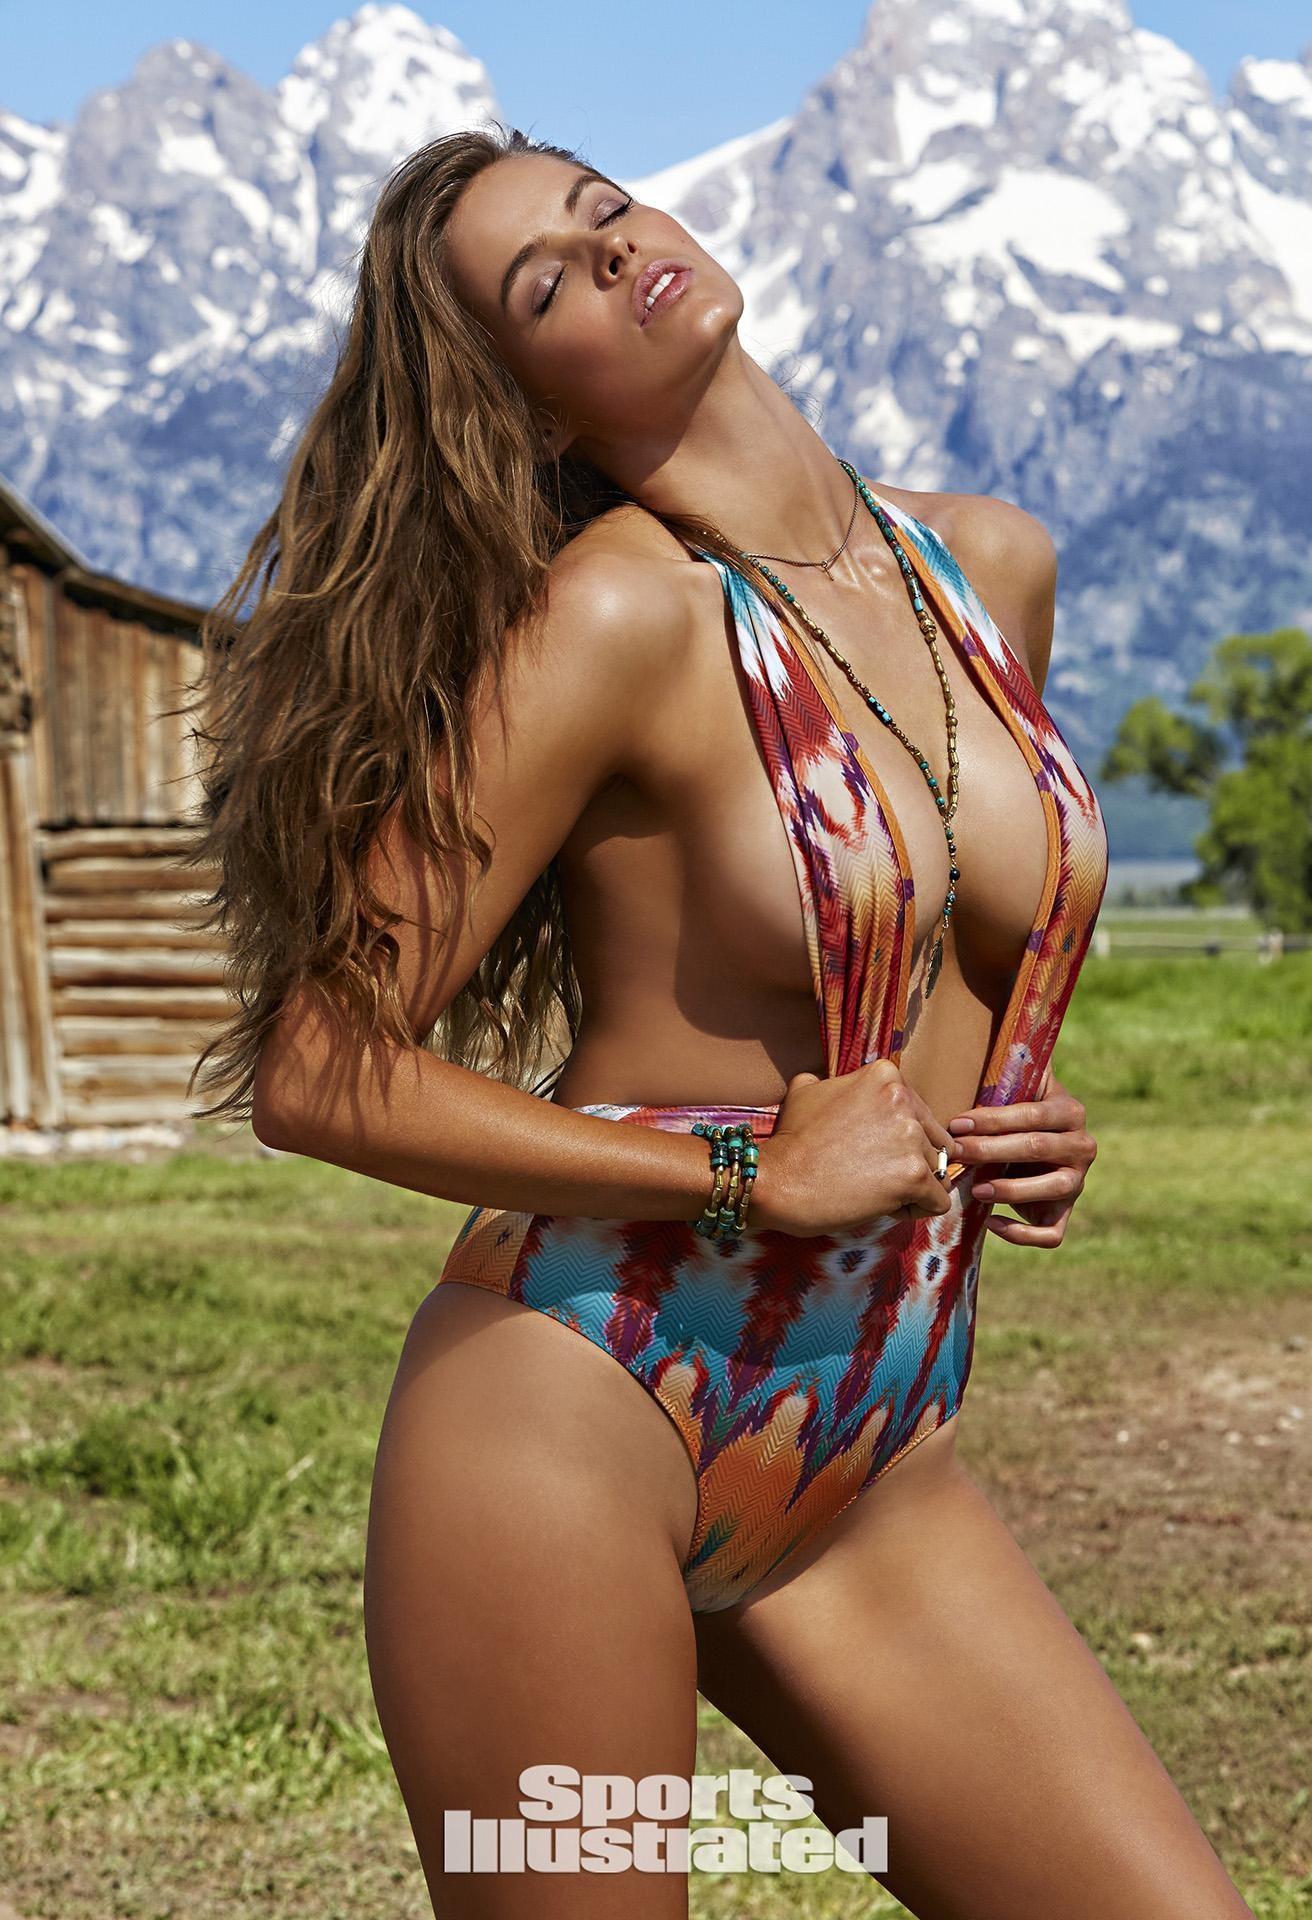 Kate bock topless,Tania CagnottoIce Bucket Challenge - 2013  Erotic video Rosie jones topless photoshoot,GIFs Zoe Tapper